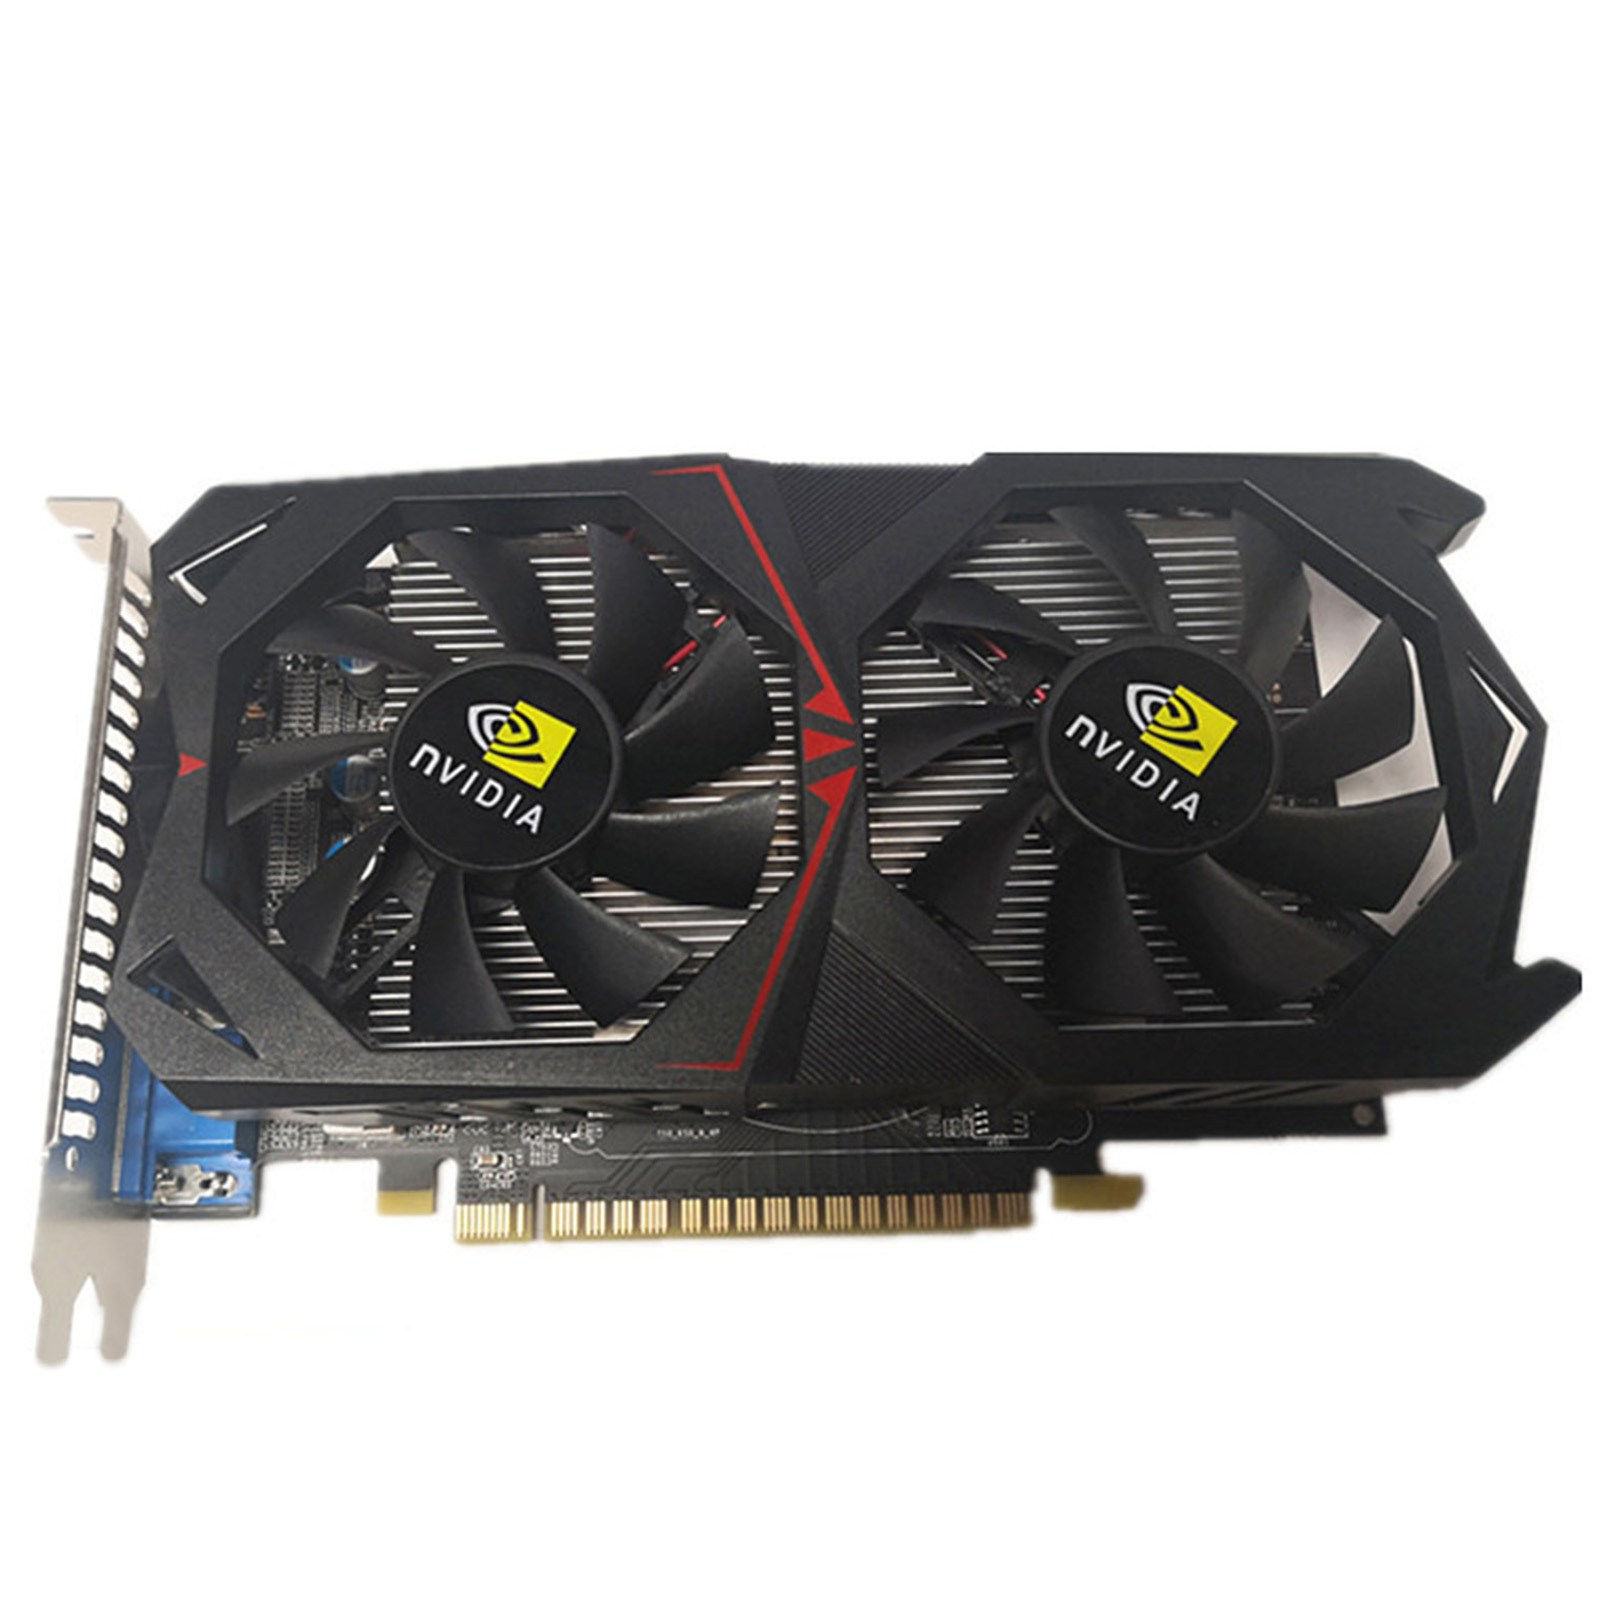 OEM GTX1050TI 그래픽 카드 독립적인 저온 작동 온도 DDR5 4GB 데스크톱용 게임 비디오 그래픽 카드, Black